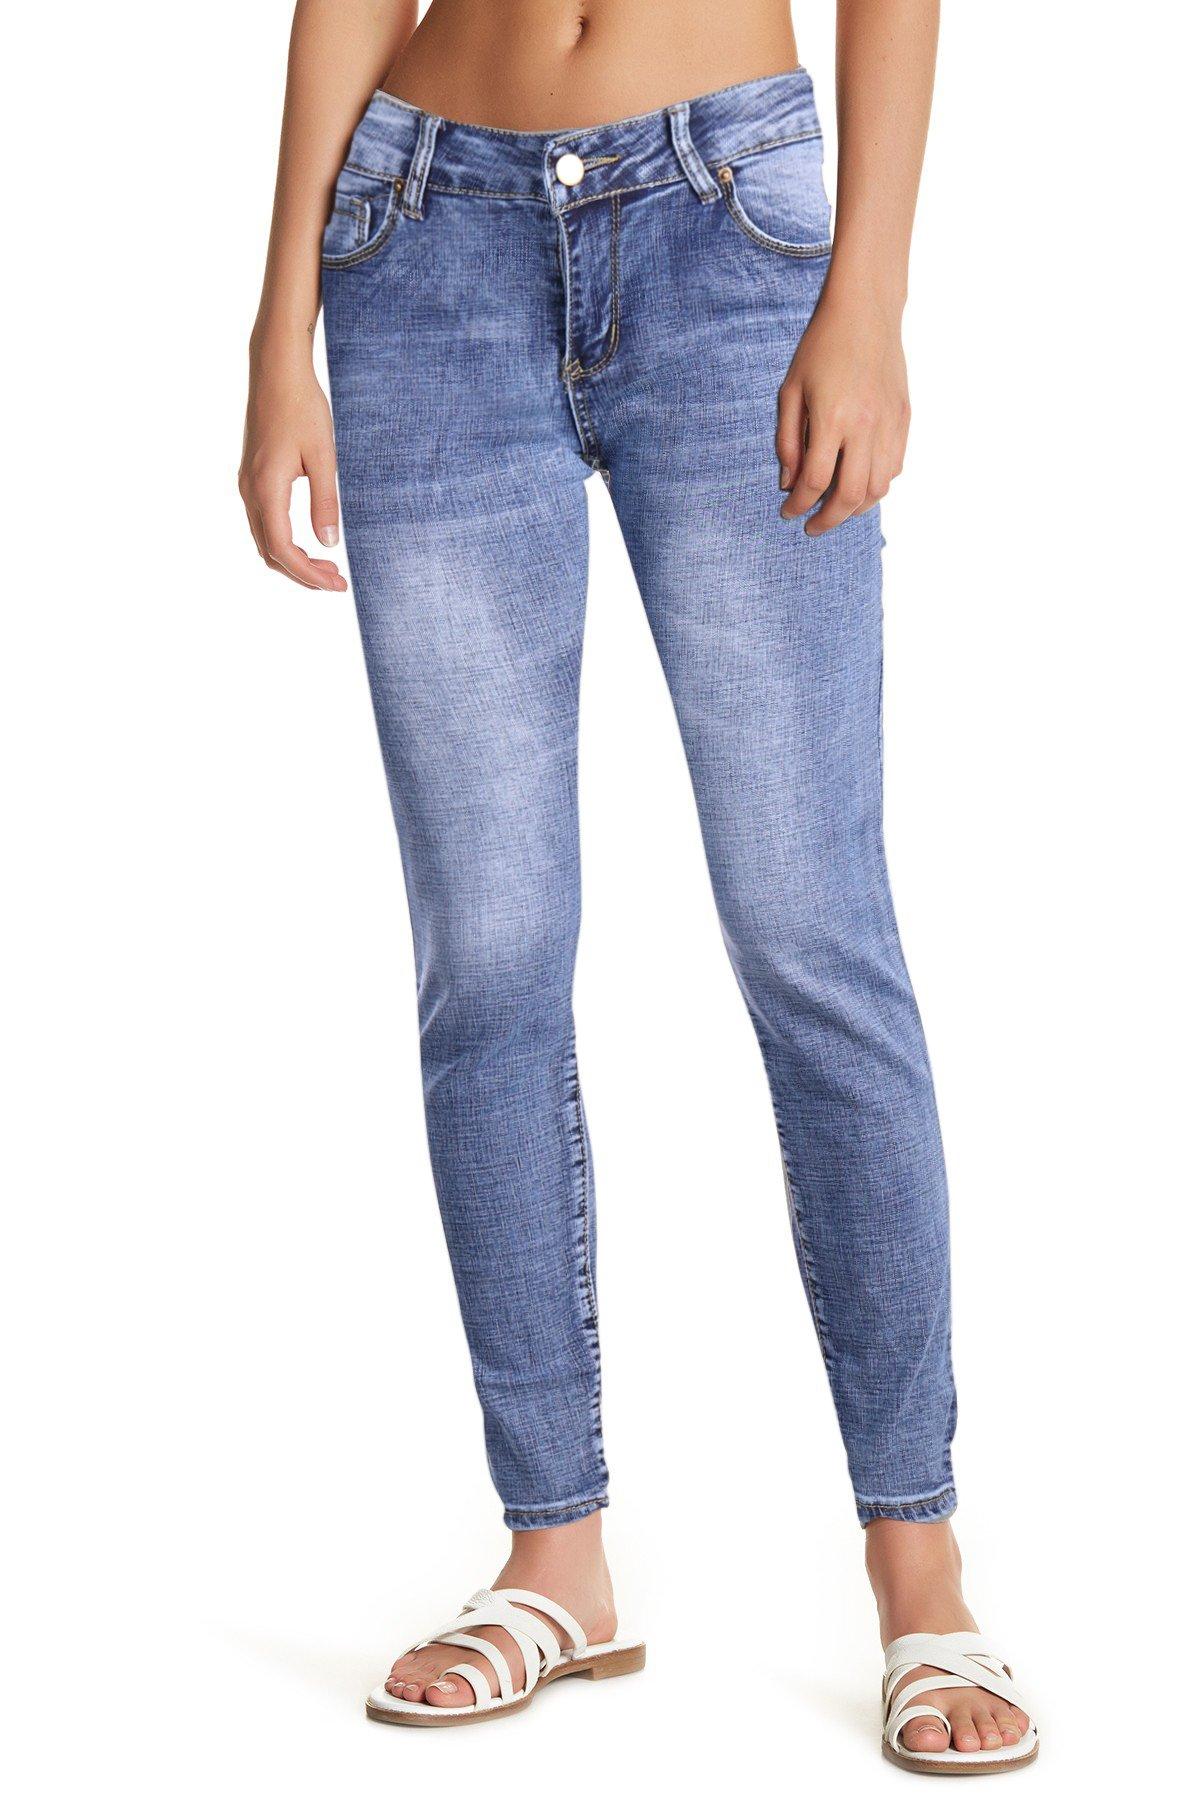 WuhouPro Super Comfy Stretch Denim Jeans AZ 1204 M.Blue 14